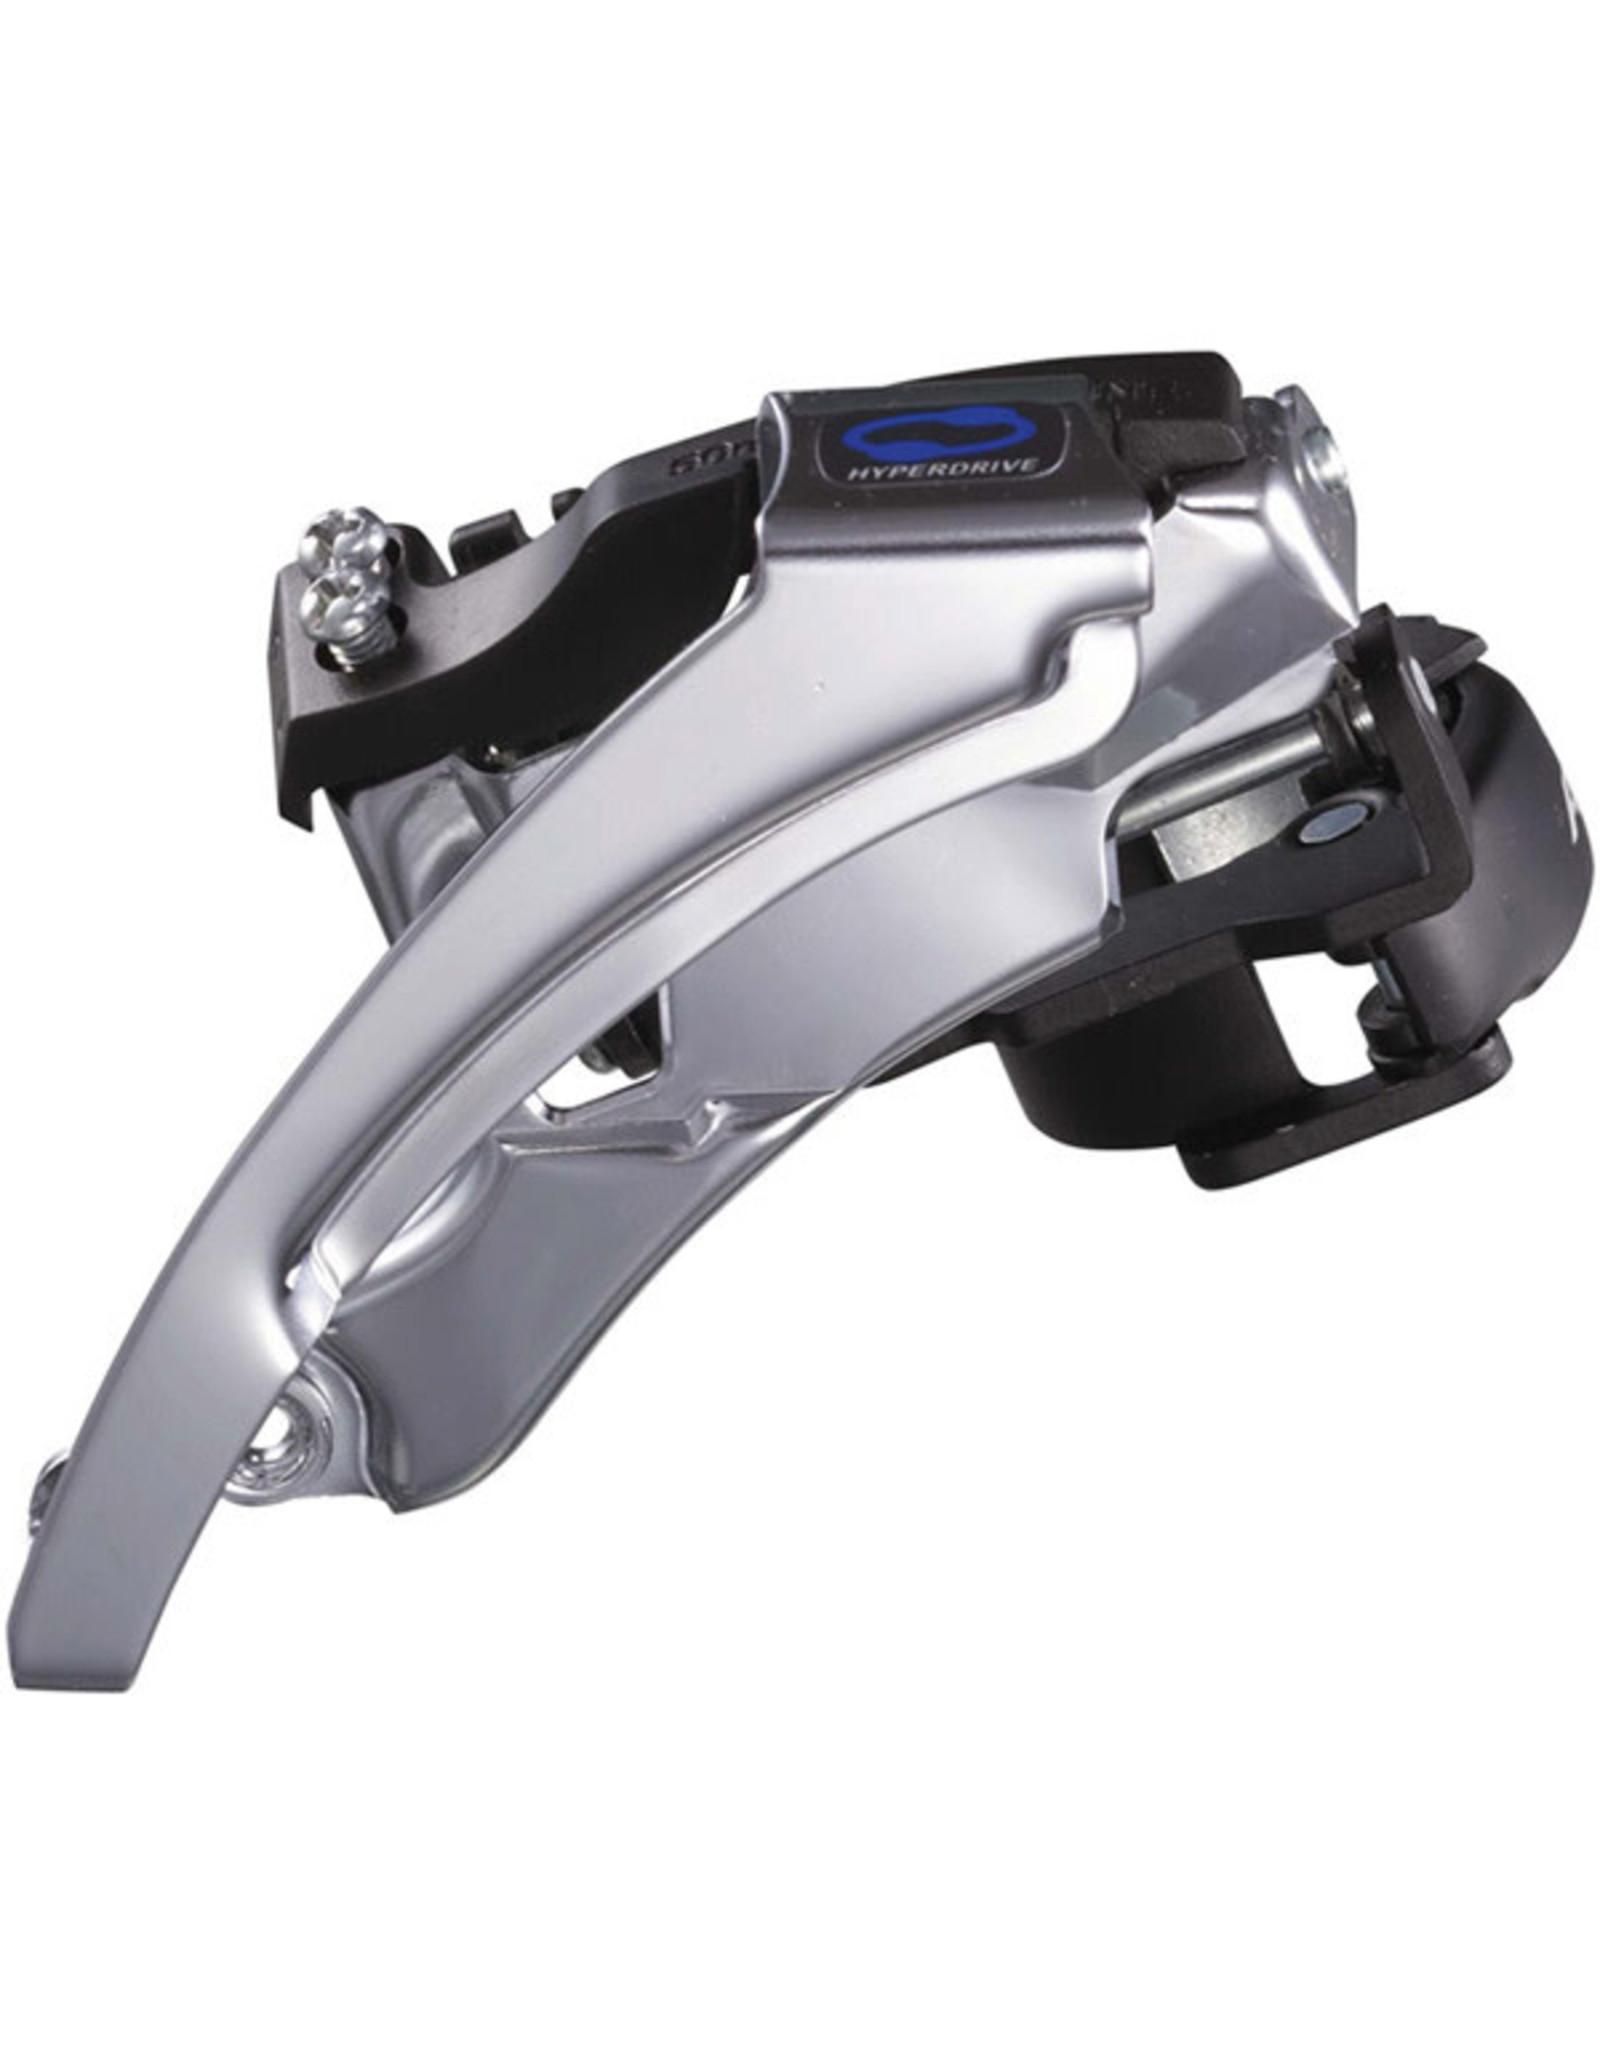 Shimano Front Derailleur Altus 8 Speed T/S Multi